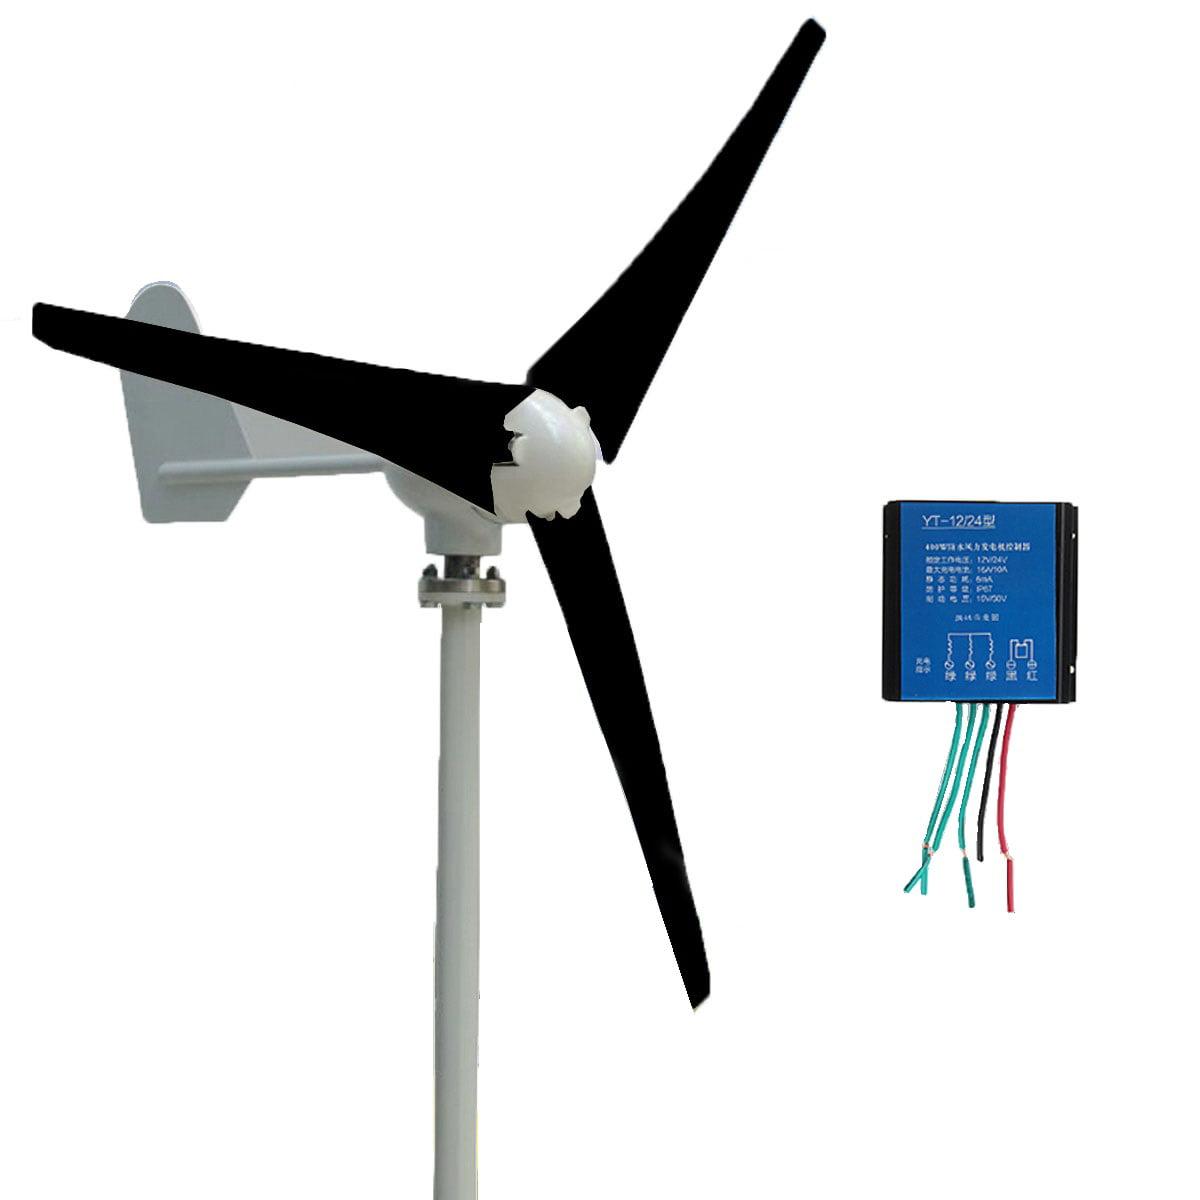 400W Power 3 Blade Wind Turbine Generator Kit AC 12 24V Aerogenerator with Windmill Charge... by